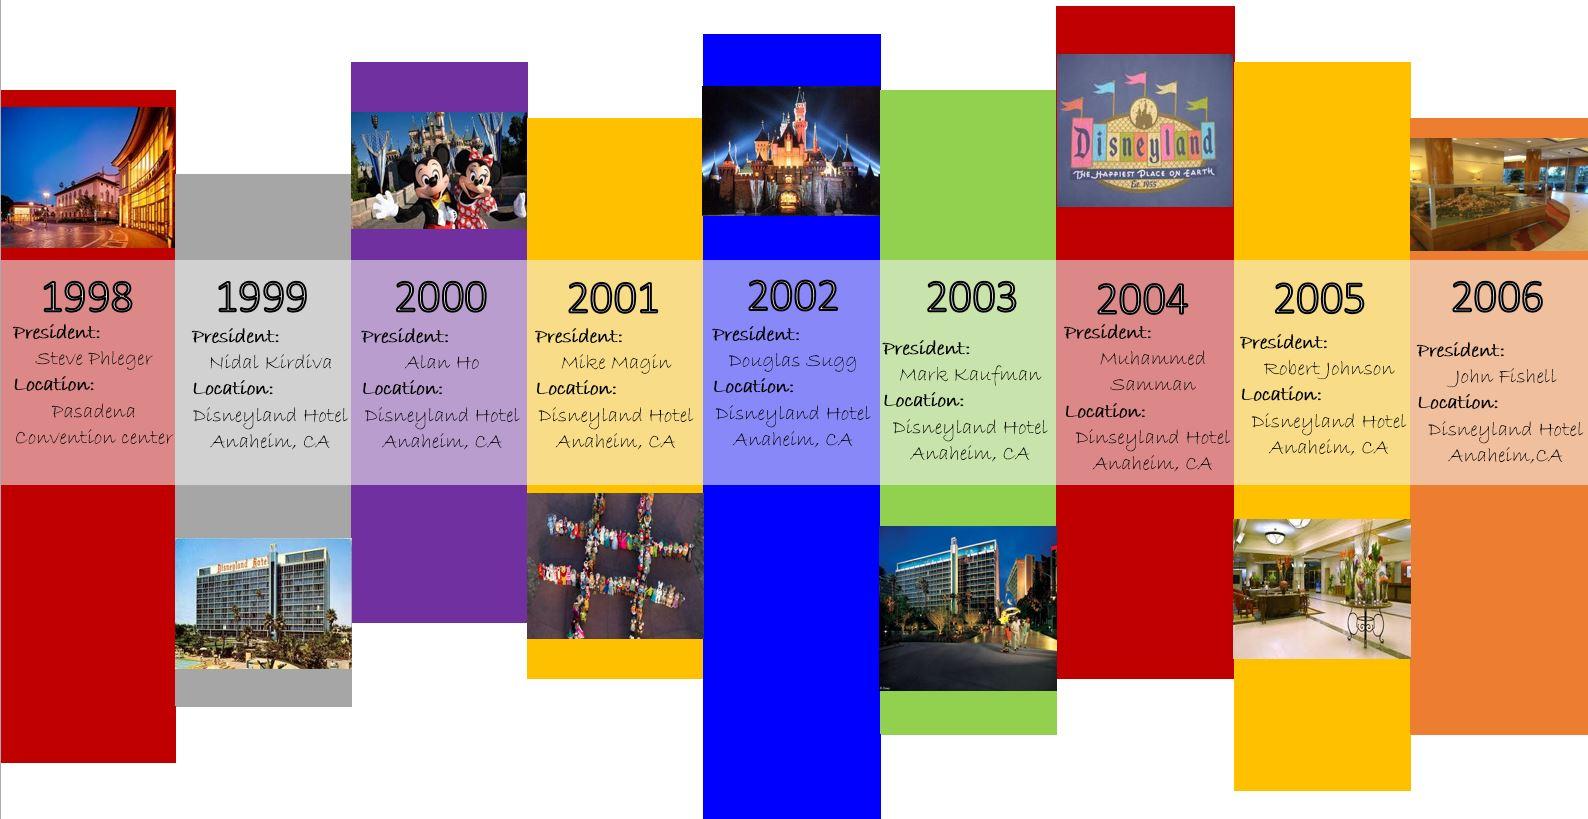 003-98-2006